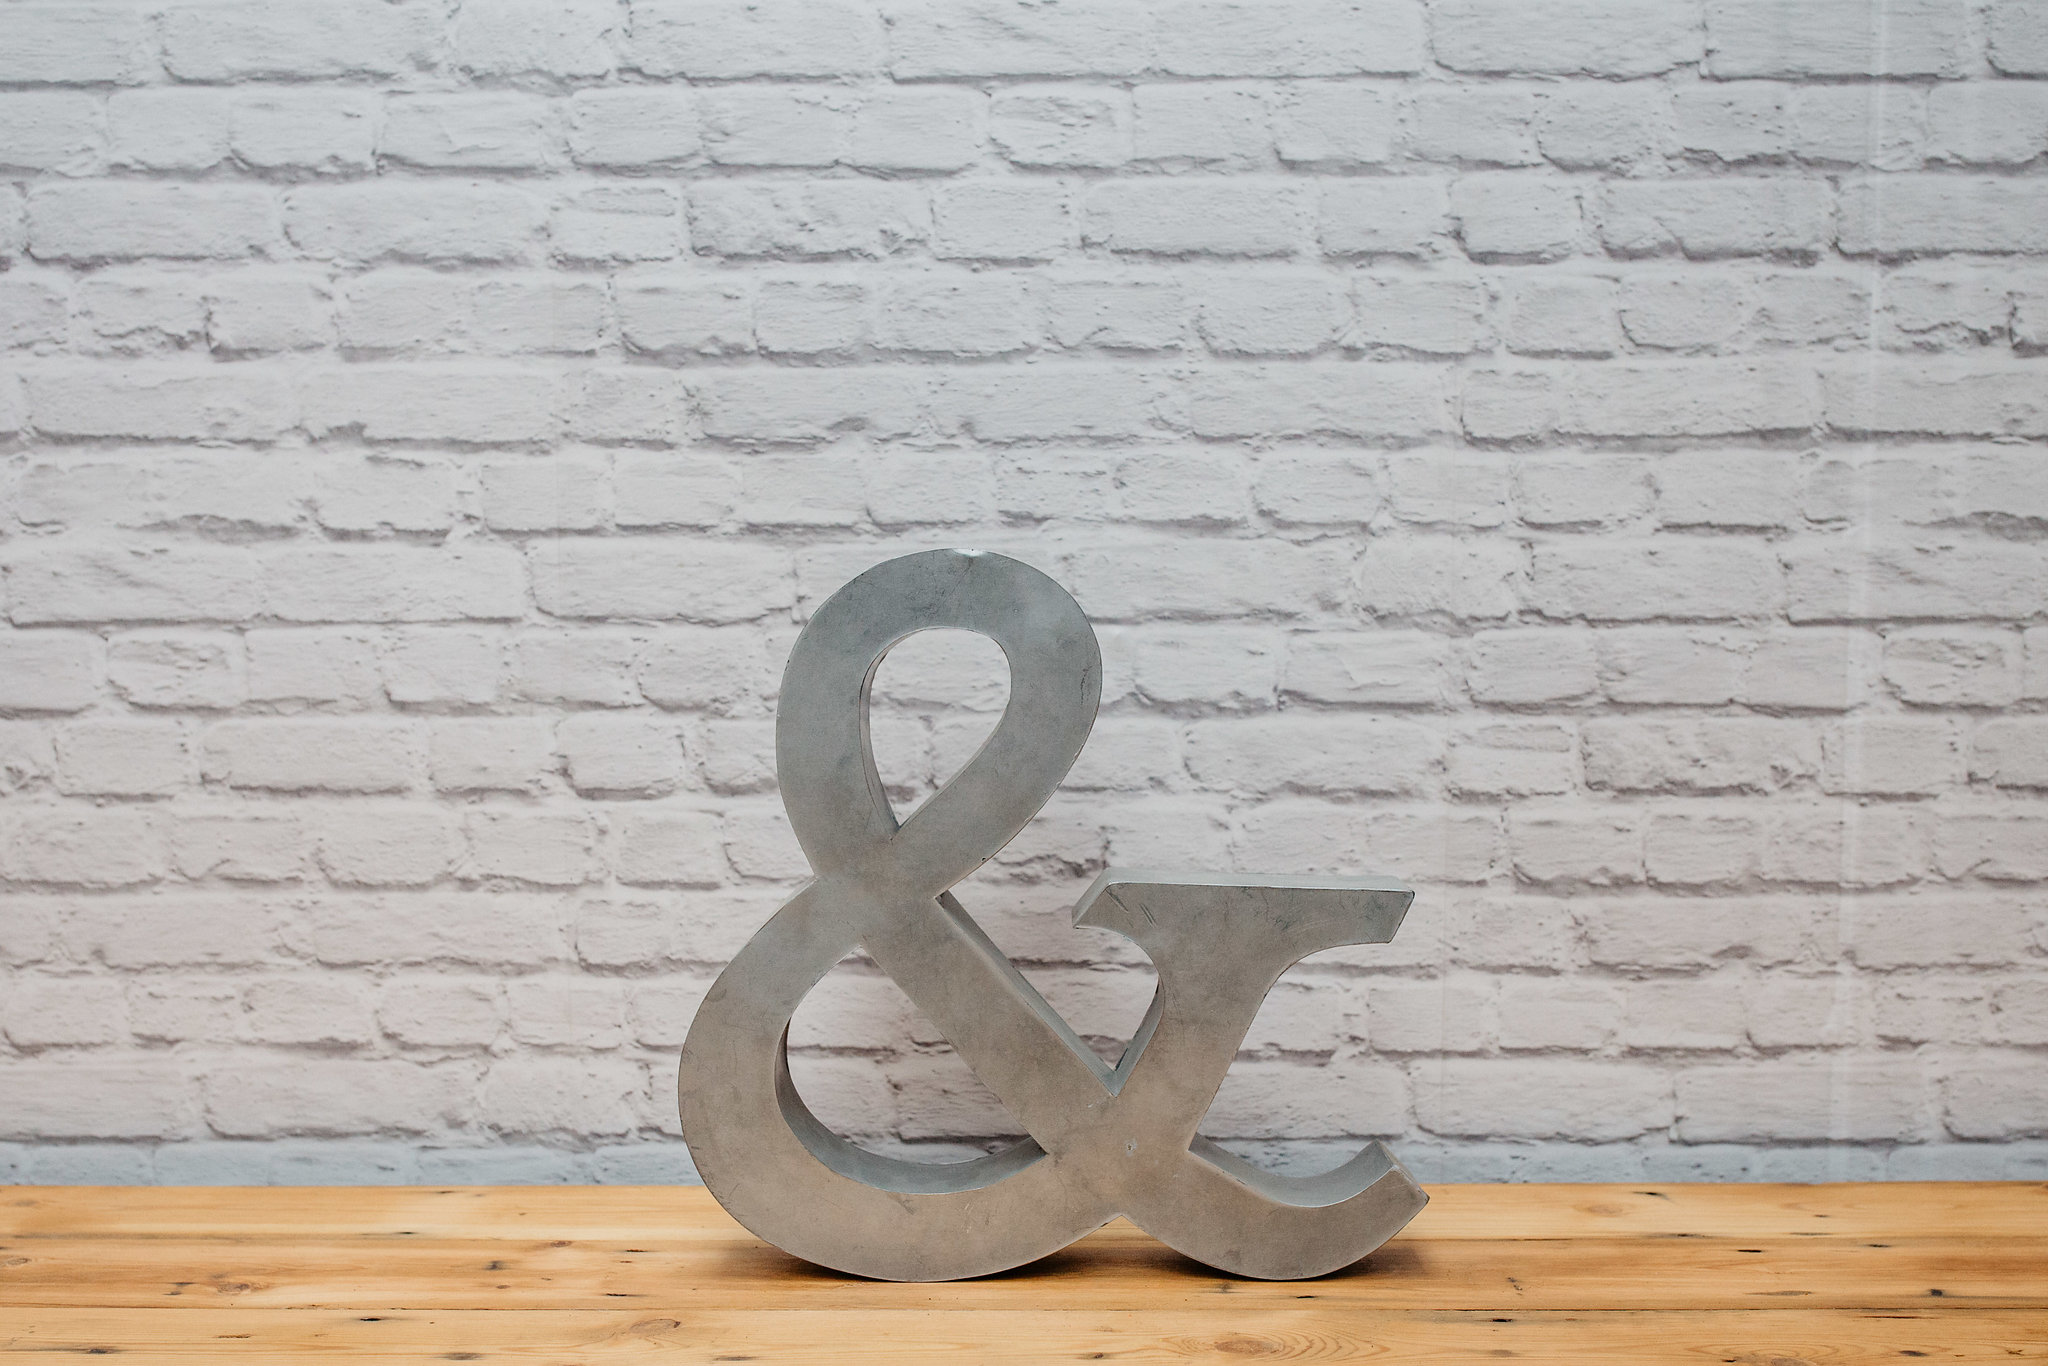 '&' Ampersand